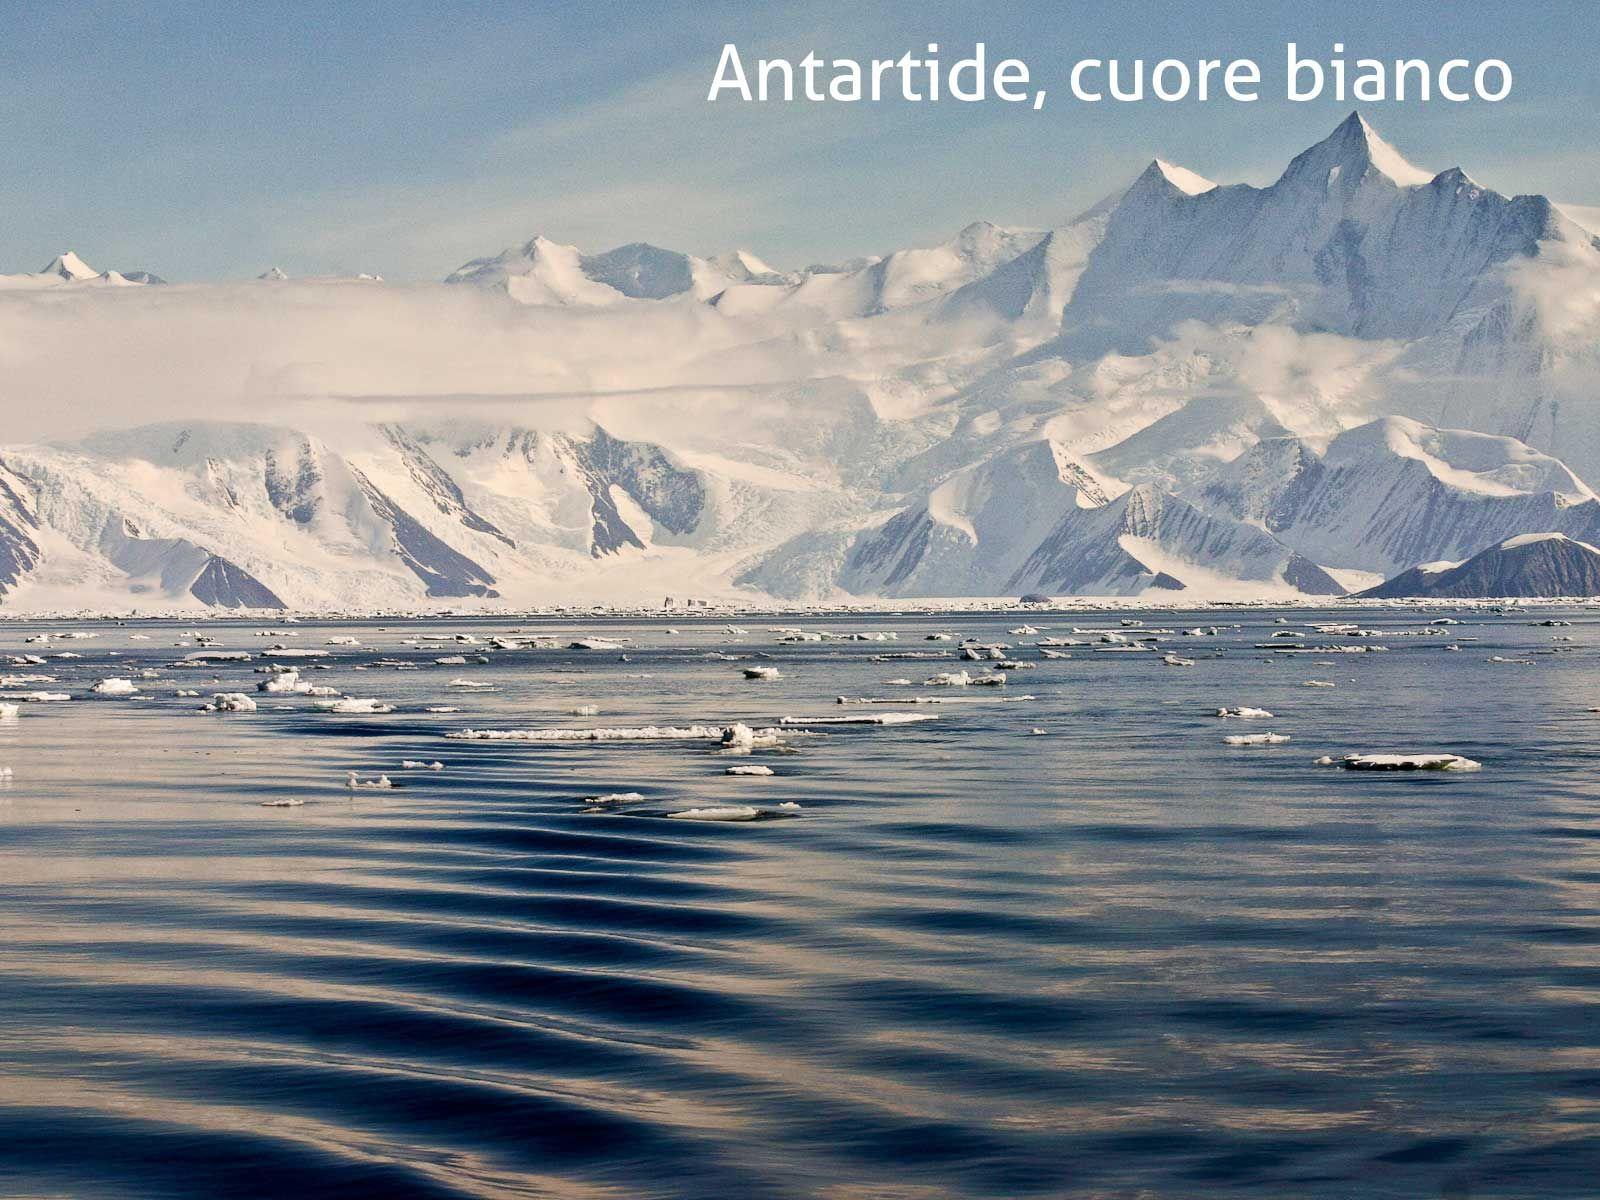 Antartide - Cuore bianco